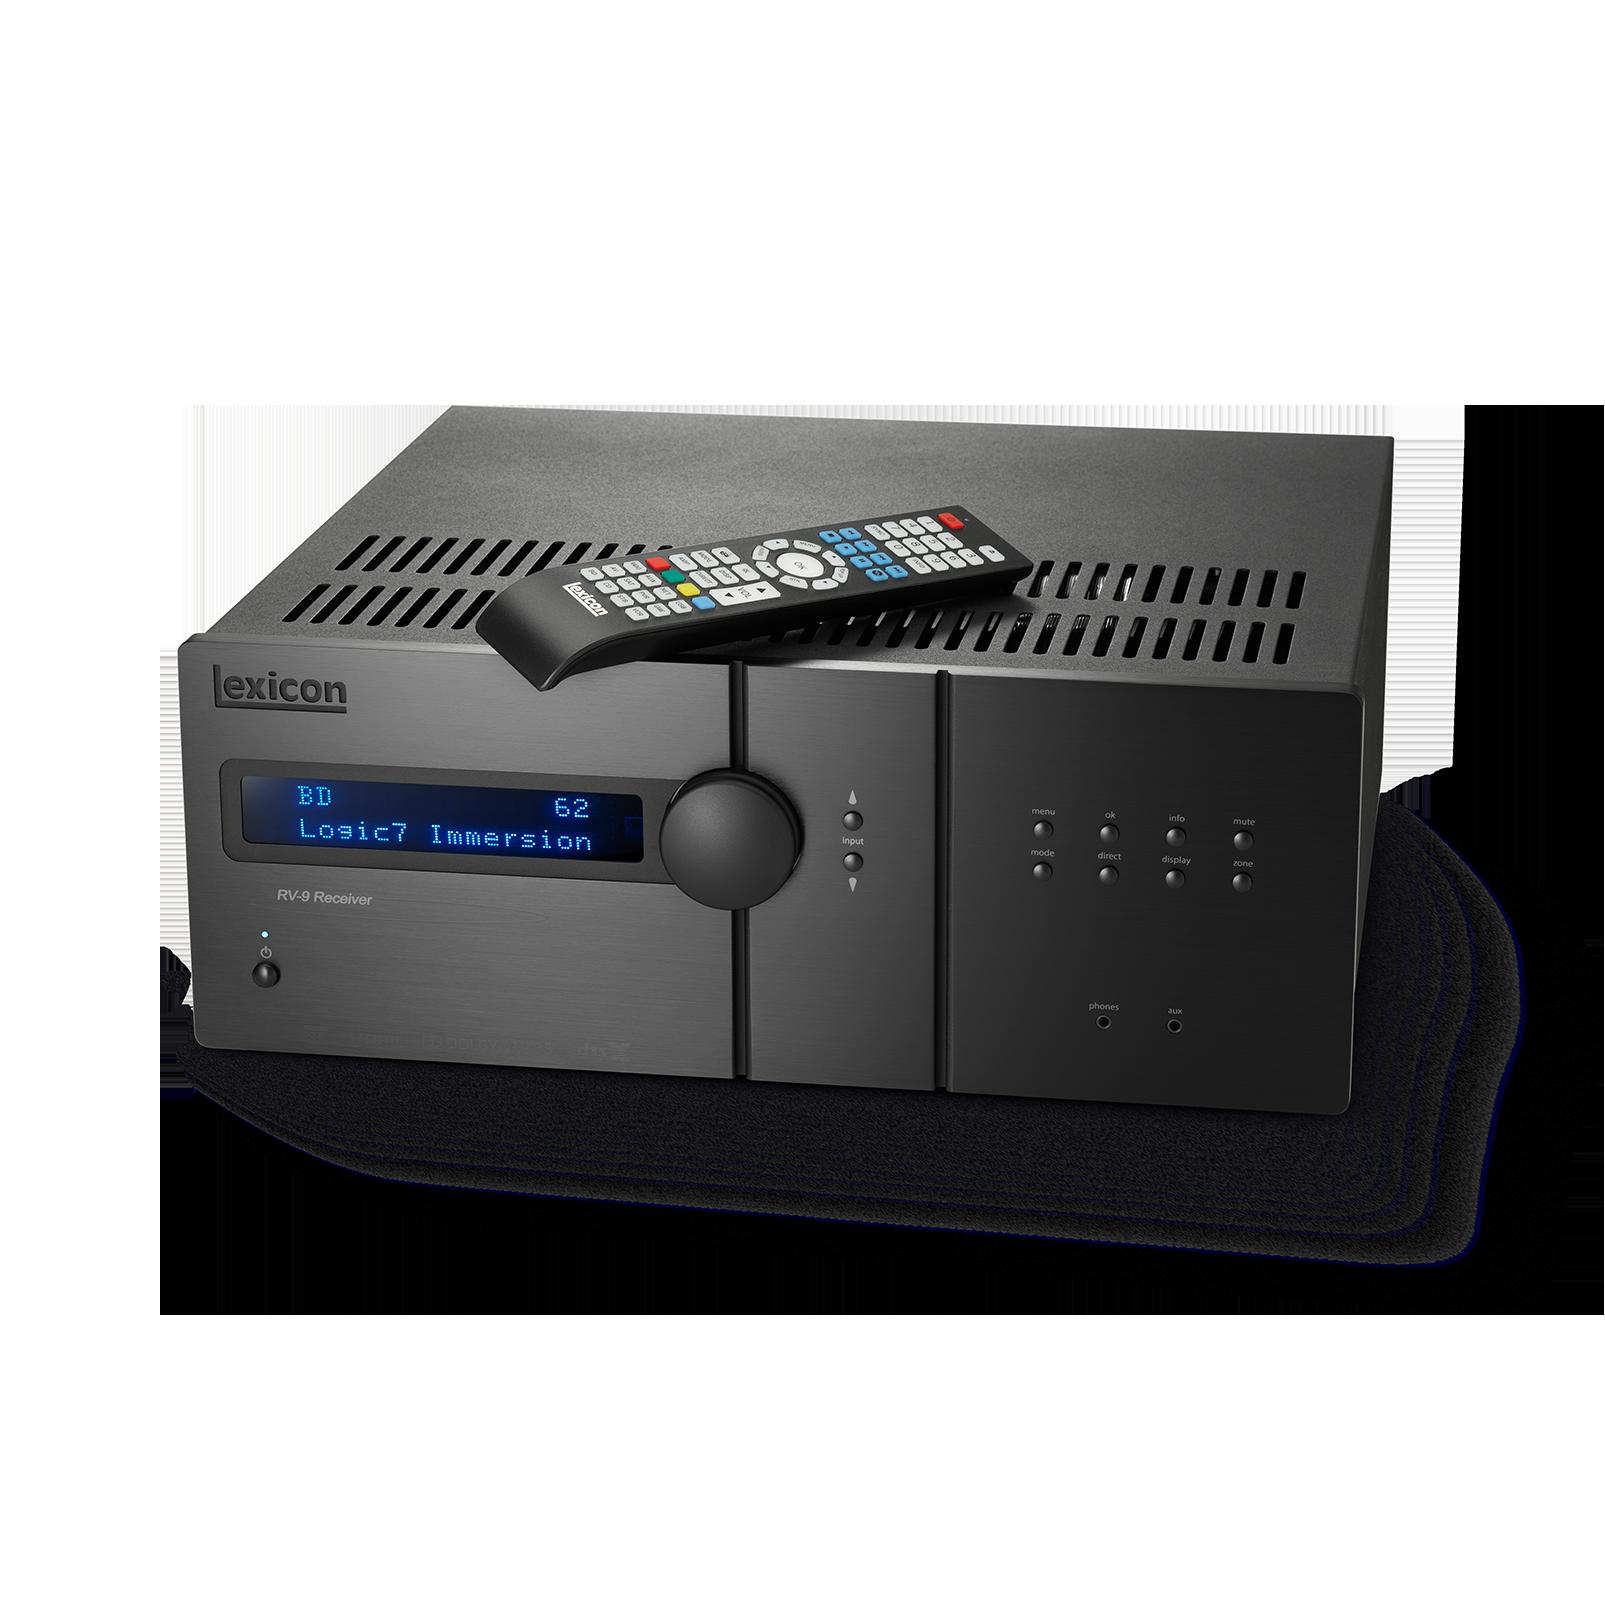 Lexicon RV-9 - Black - Class G Immersive Surround Sound AVR - Detailshot 1